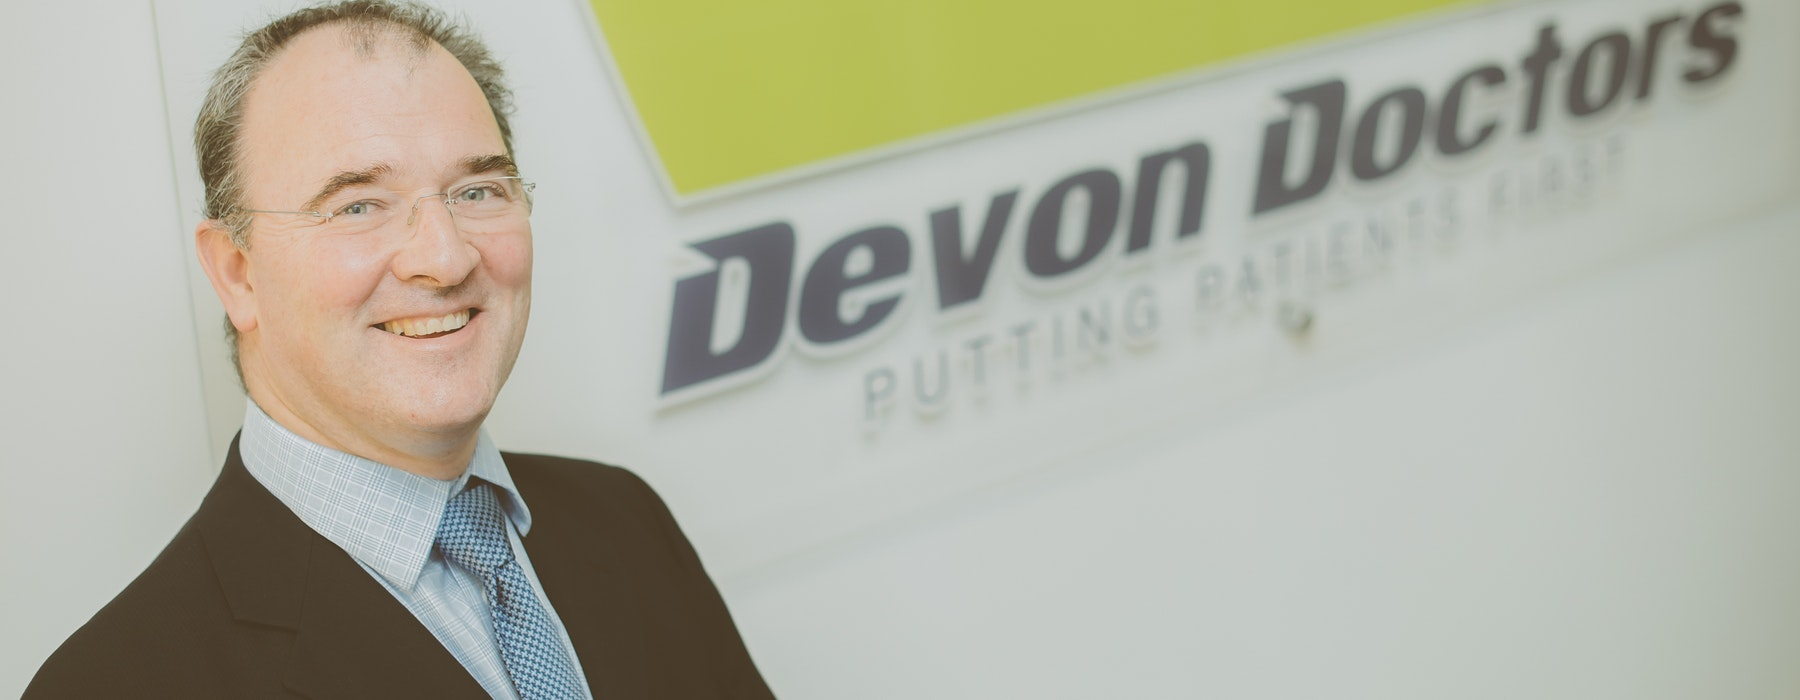 Chief Executive of Devon Doctors, Dr Justin Geddes